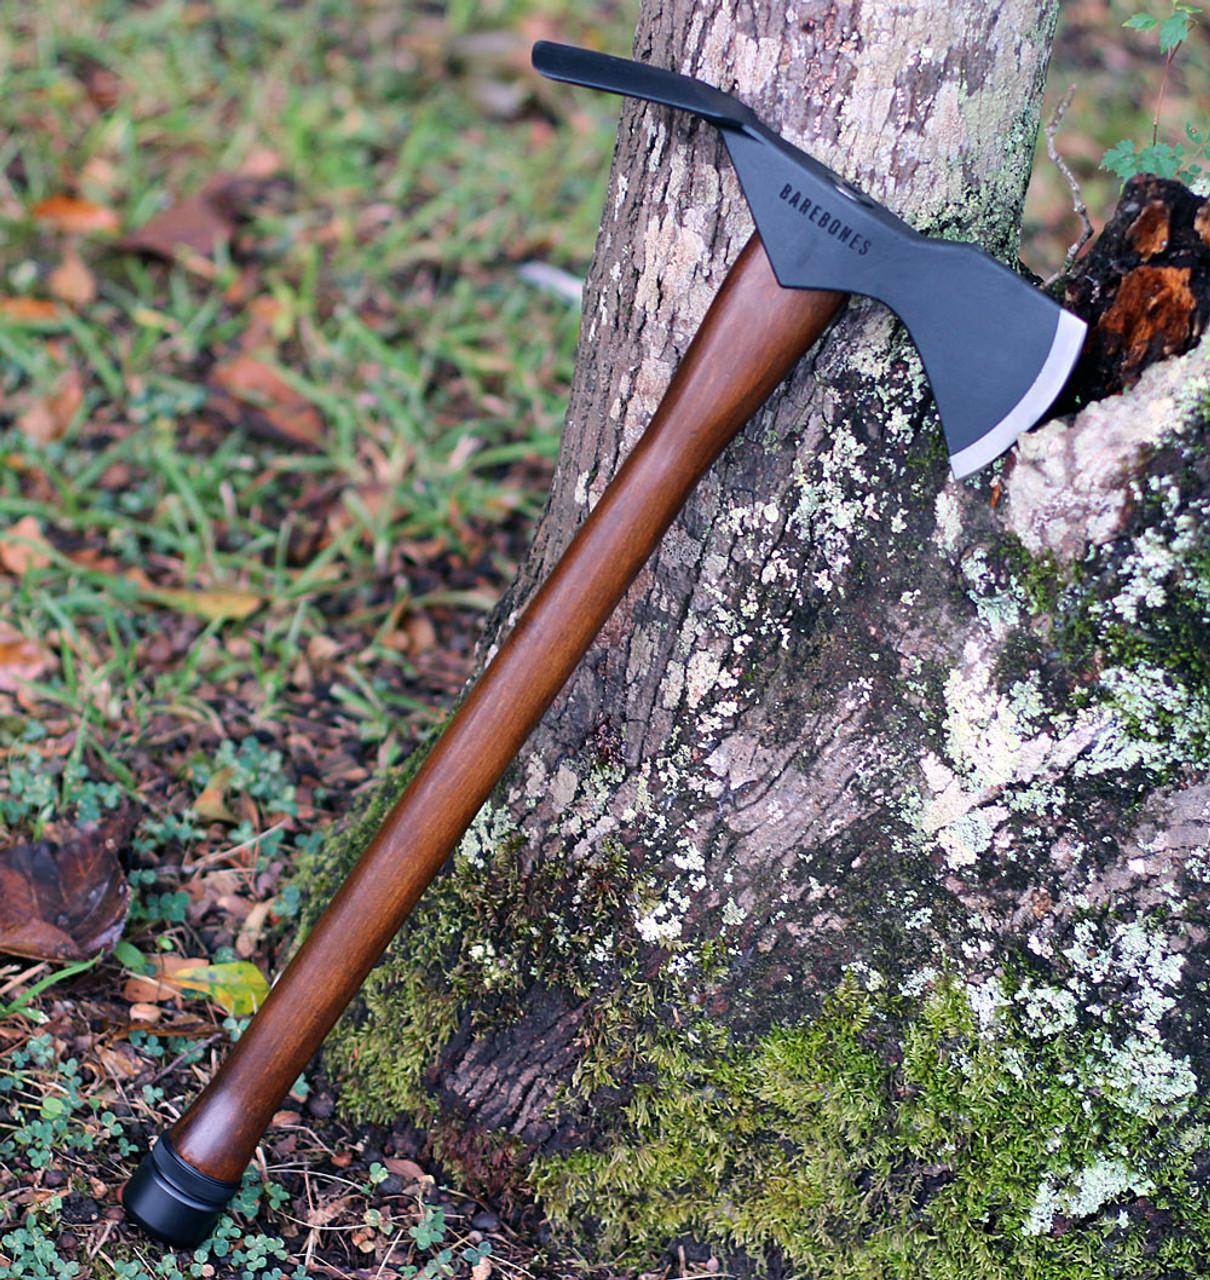 "BareBones Living Woodsman Pulaski Axe, 24"" Overall, Oiled Beech Wood Handle"